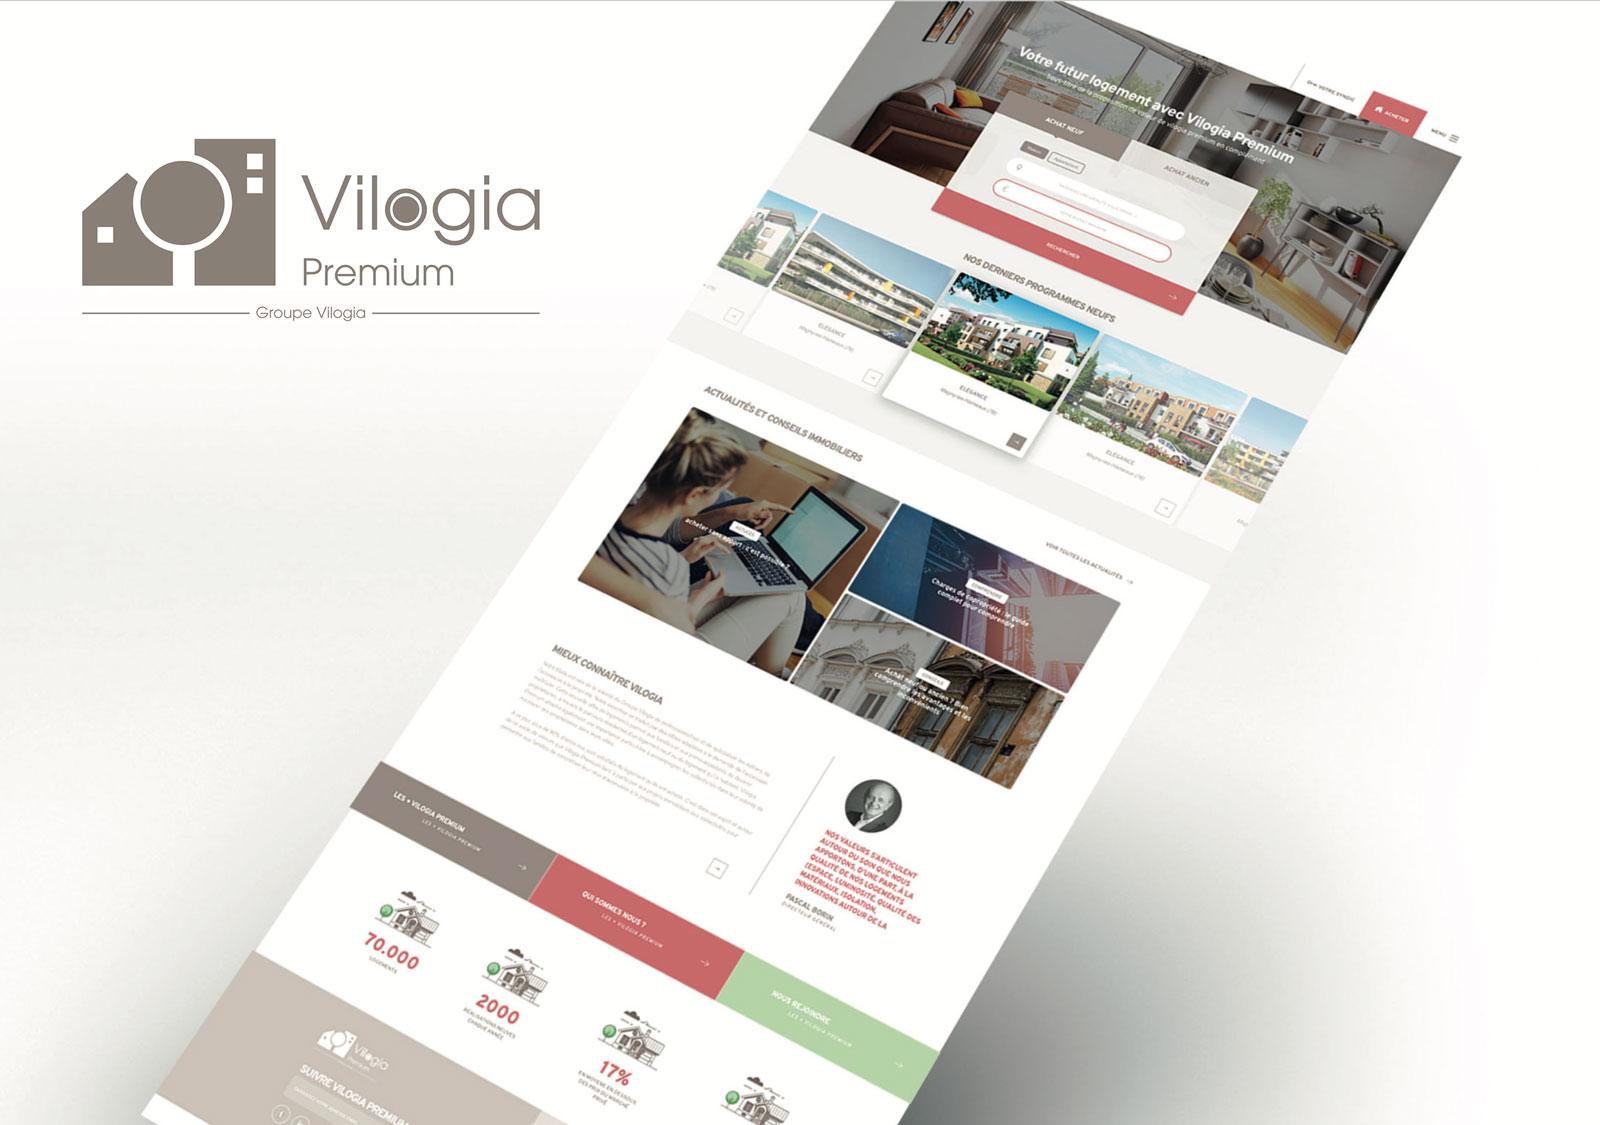 vilogia-premium-whatsonweb